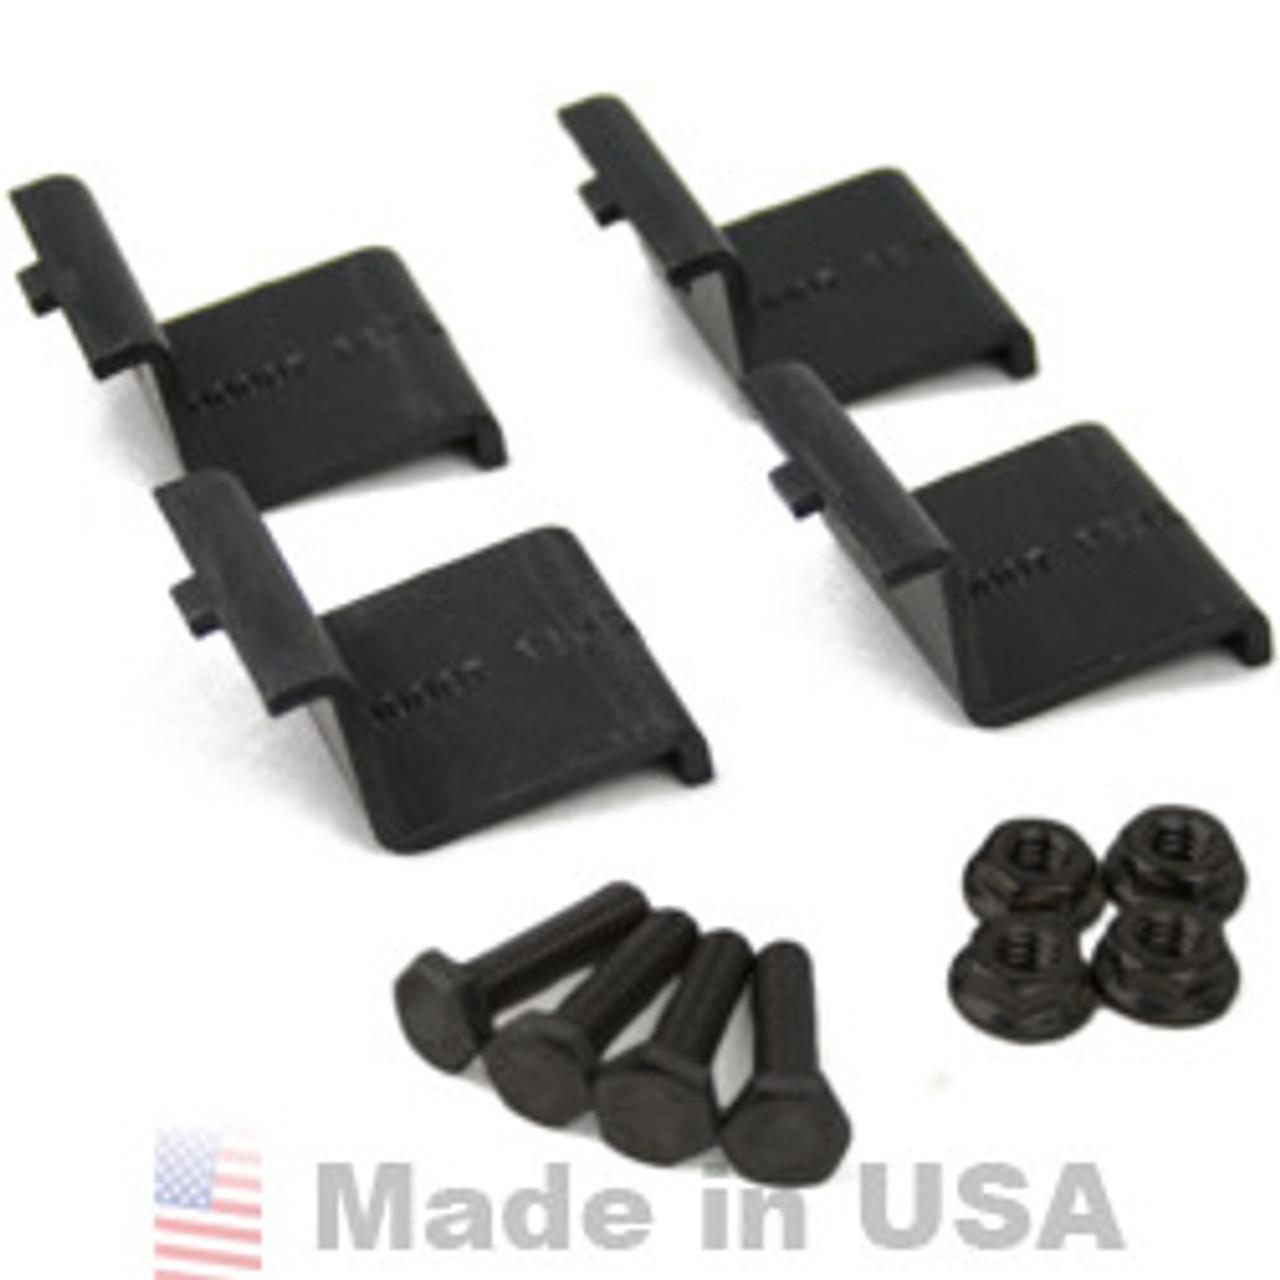 IronRidge XRS End Clamp Kit (4 Pack) K - black